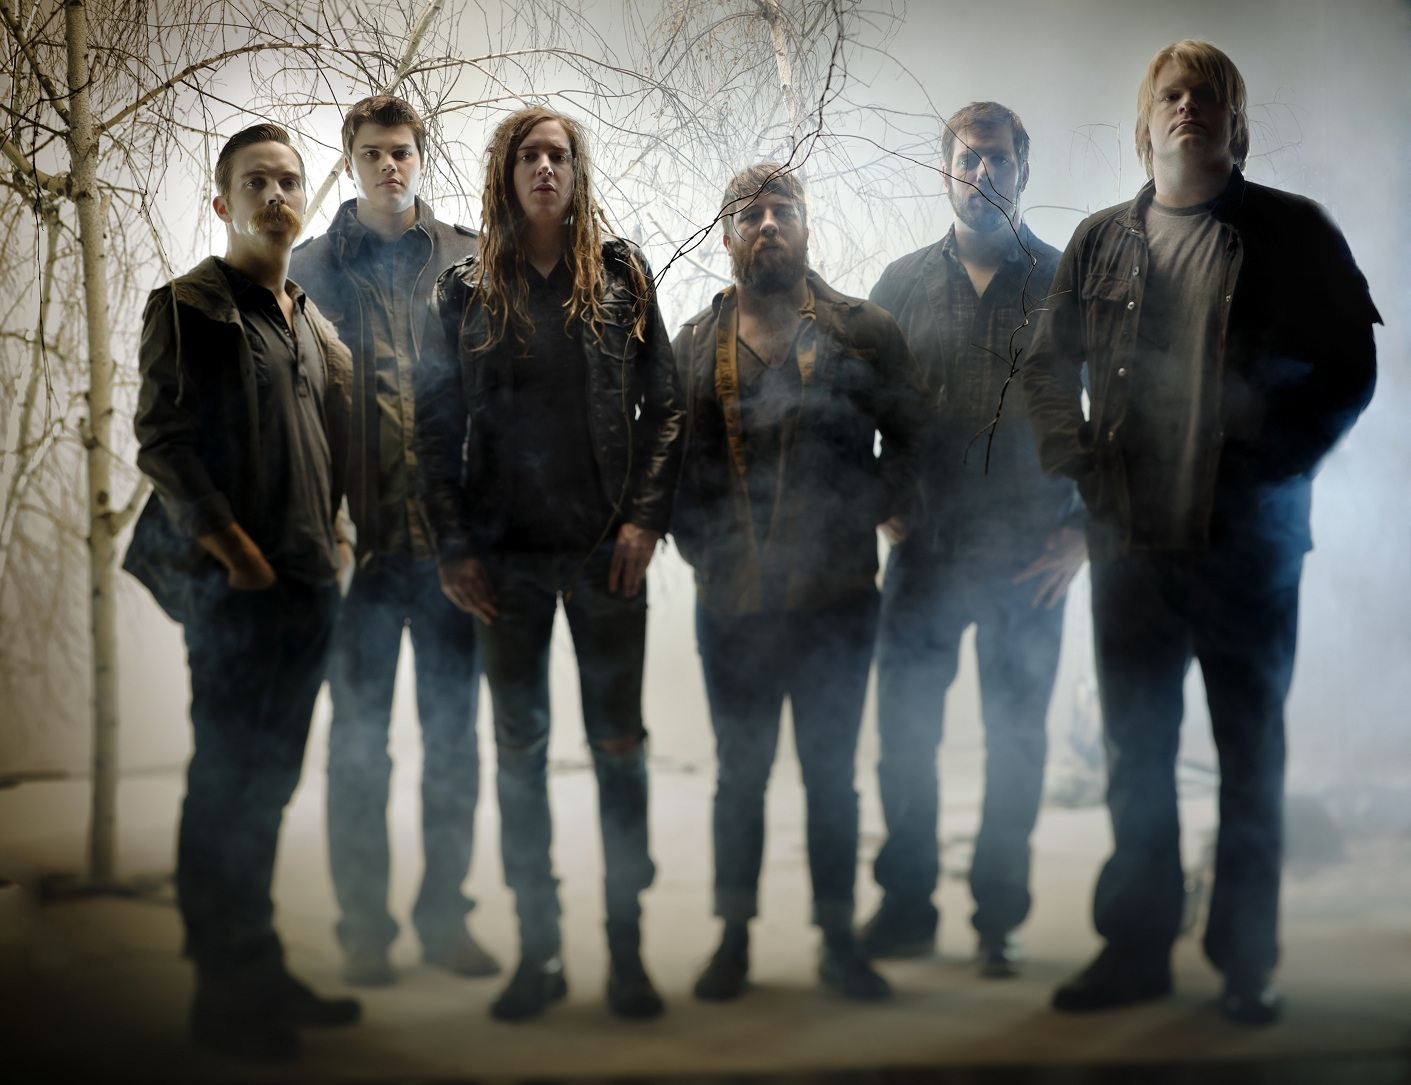 Underoath, Dream On, Dreamer & The Smoking Hearts sidewaves announced